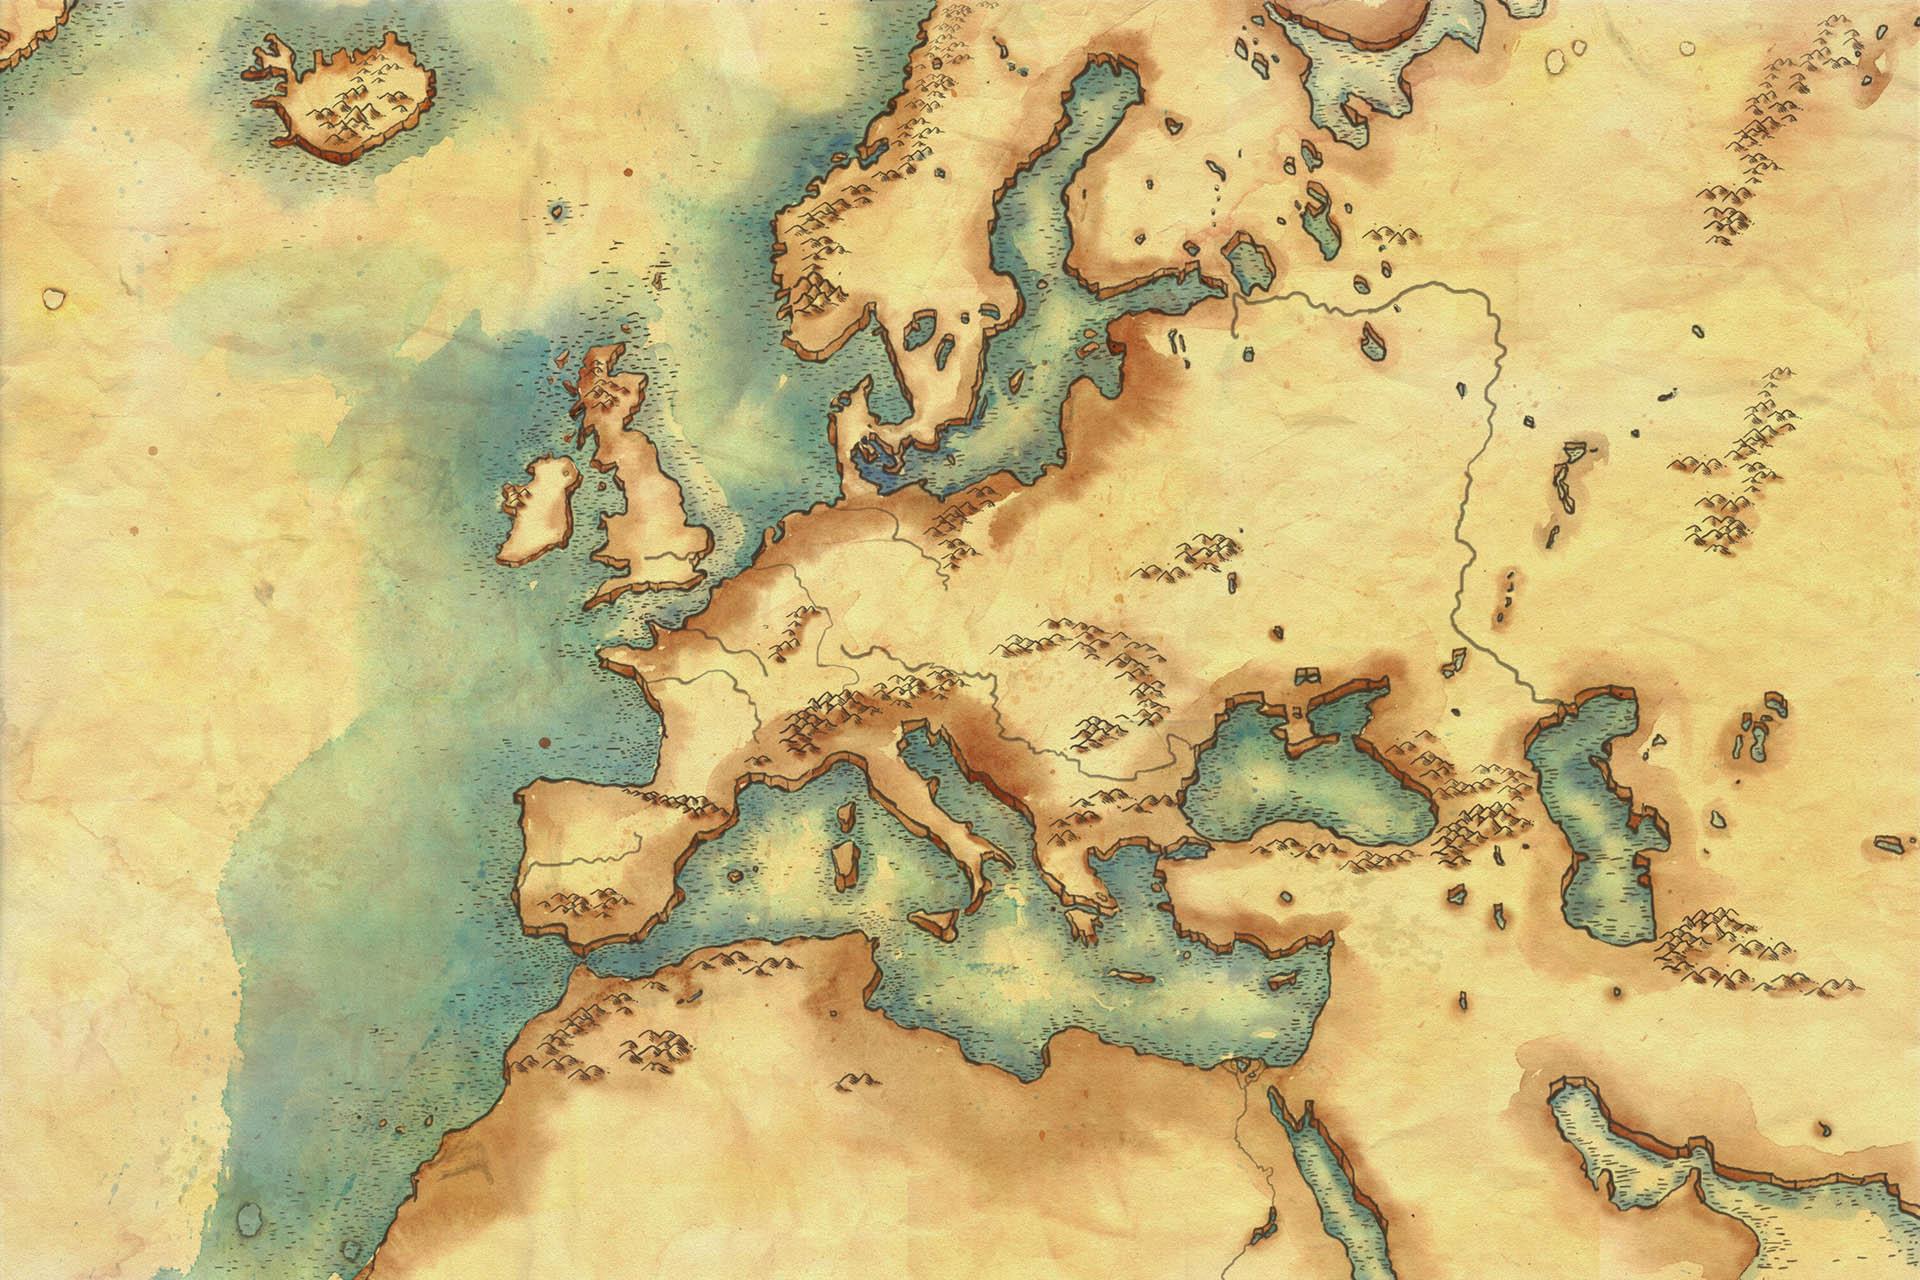 Europe Fantasy Map • Board Game